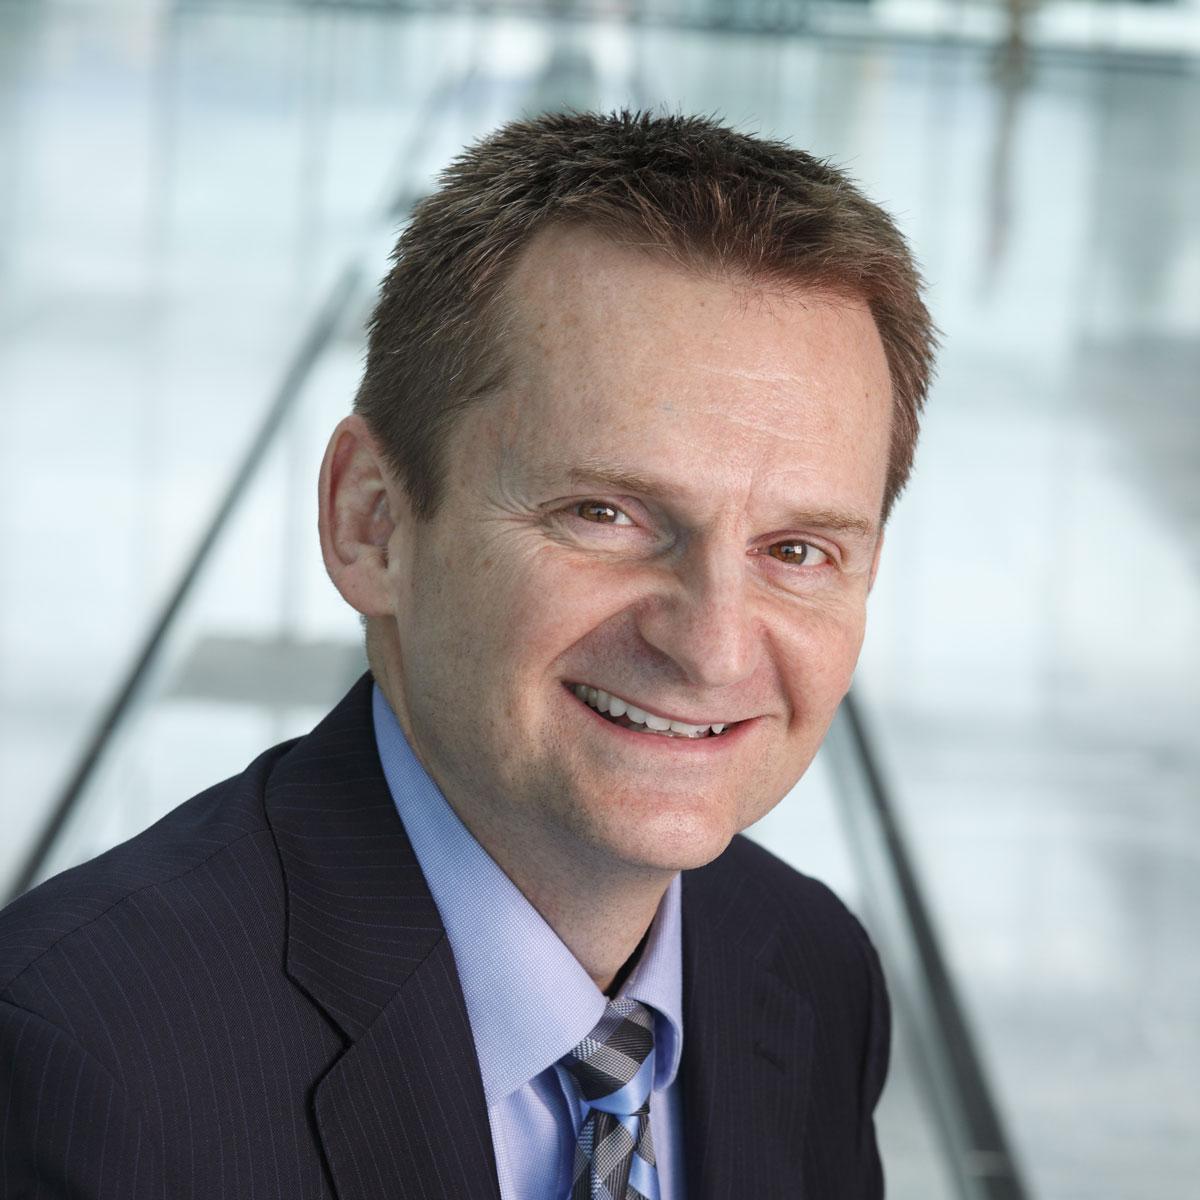 Curt McDaniel